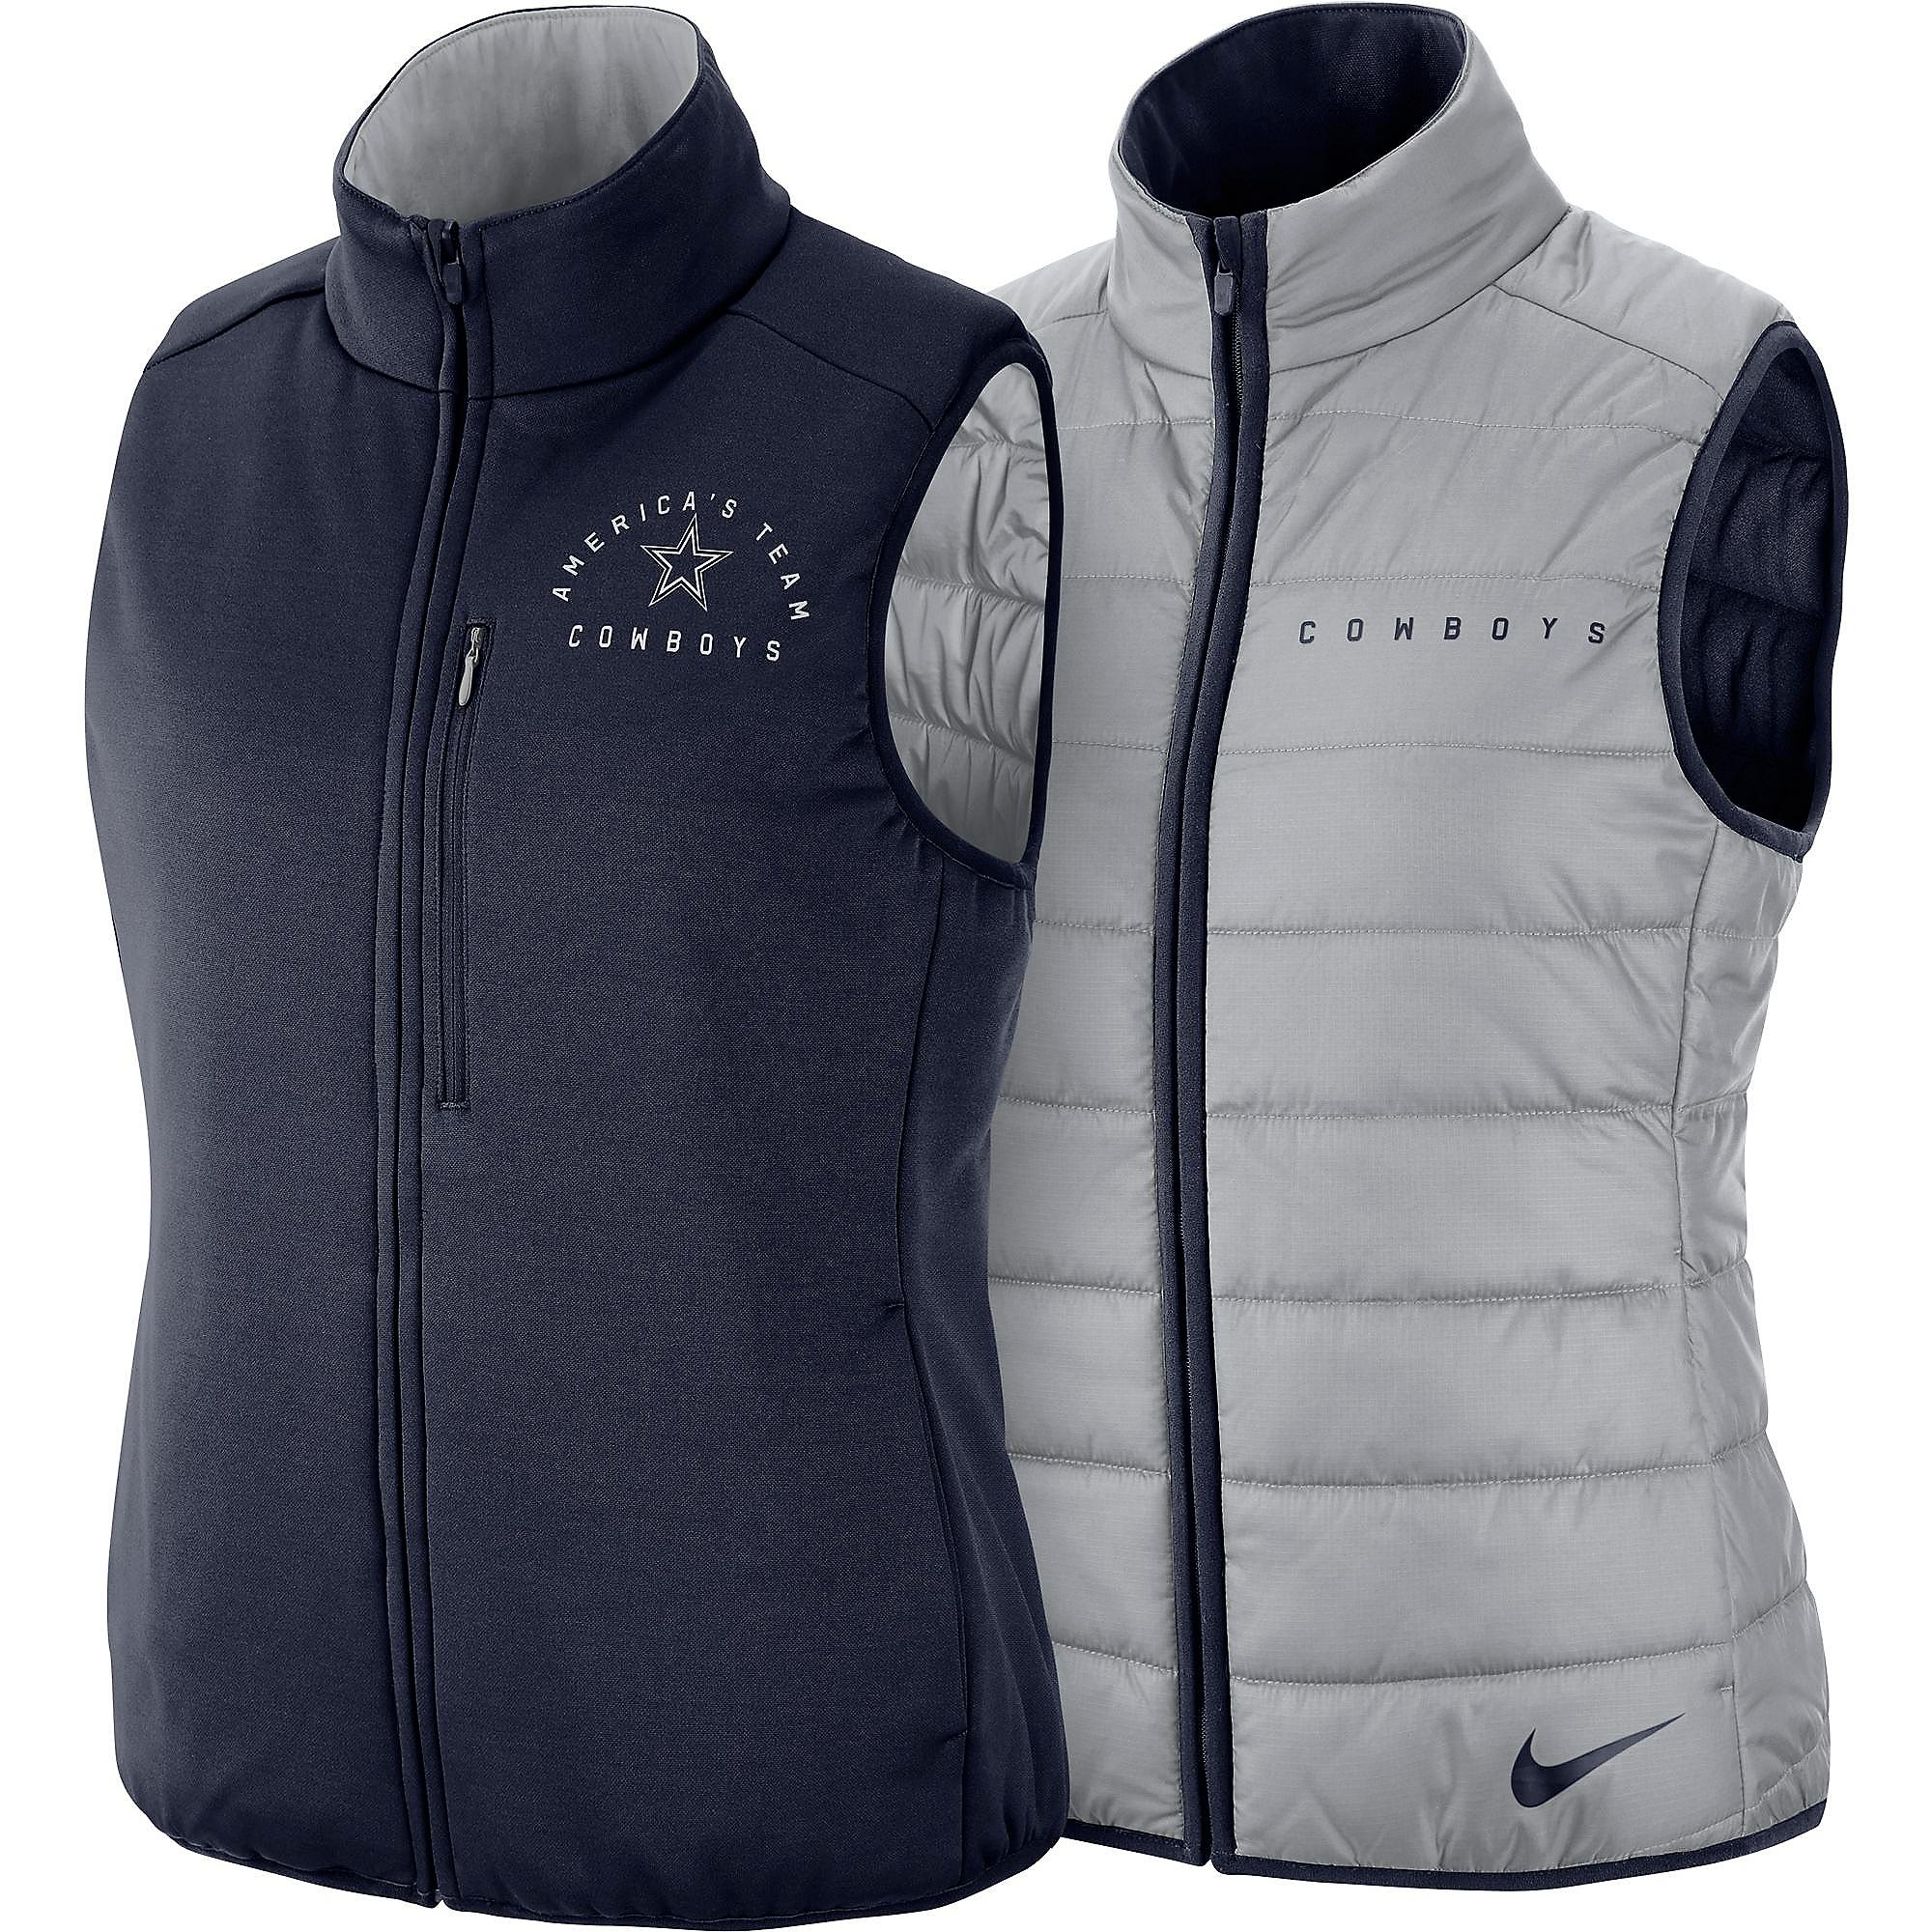 designer fashion f9c44 49259 Dallas Cowboys Nike Womens Reversible Vest | Dallas Cowboys Pro Shop